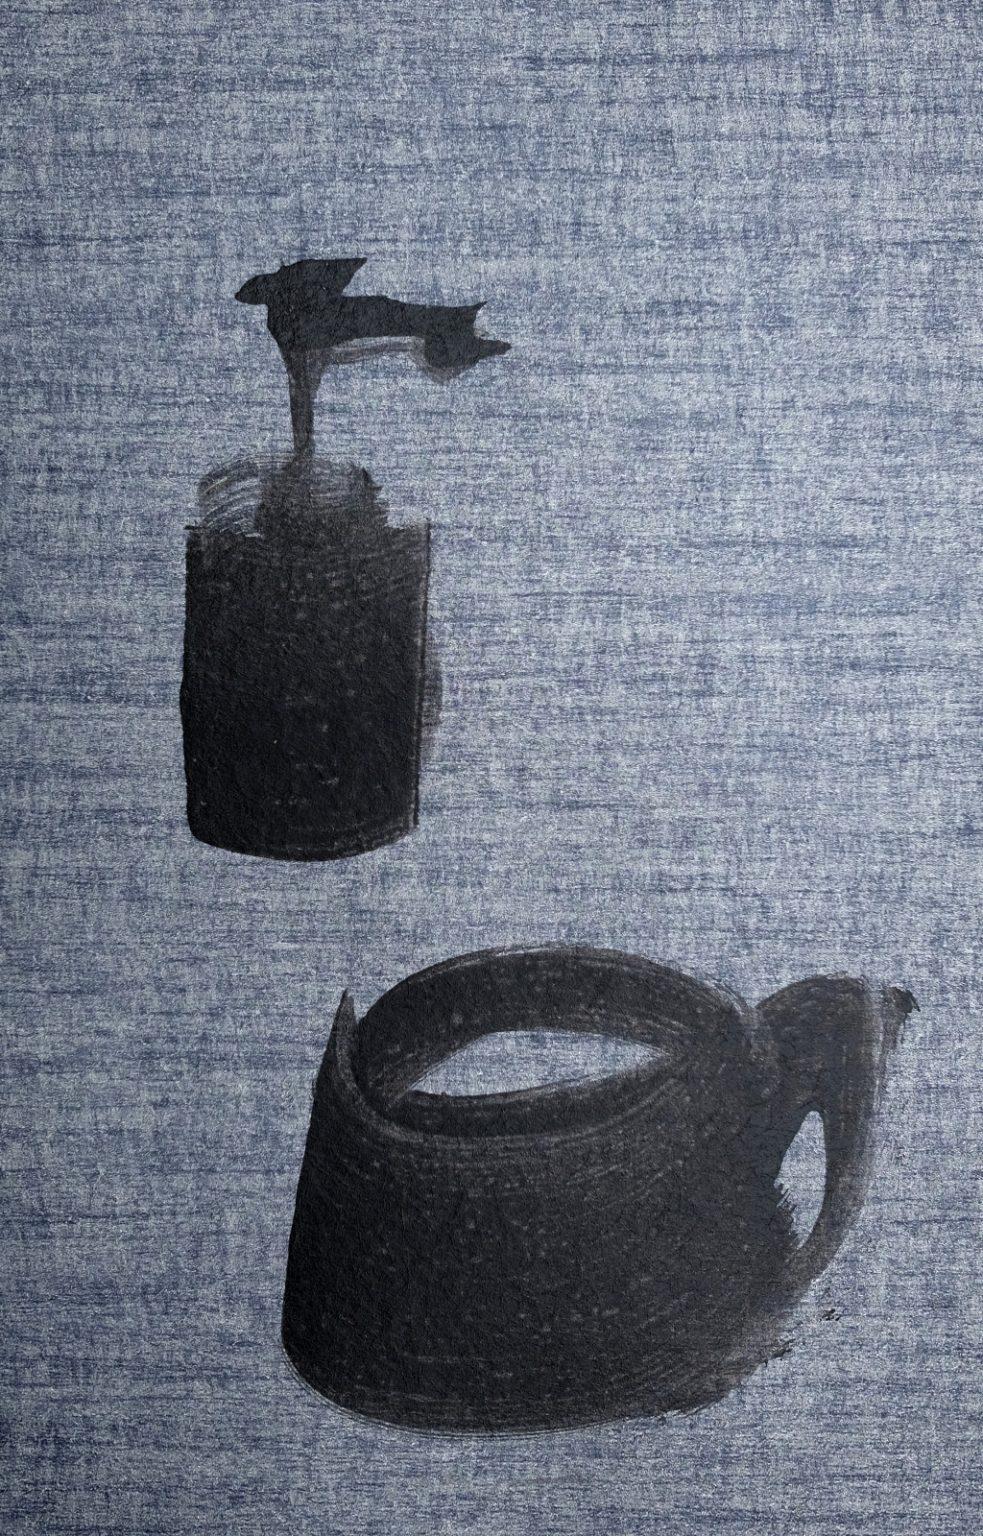 Koetzier van Hooff | Wallpaper Series | Still Life on Blue Grey